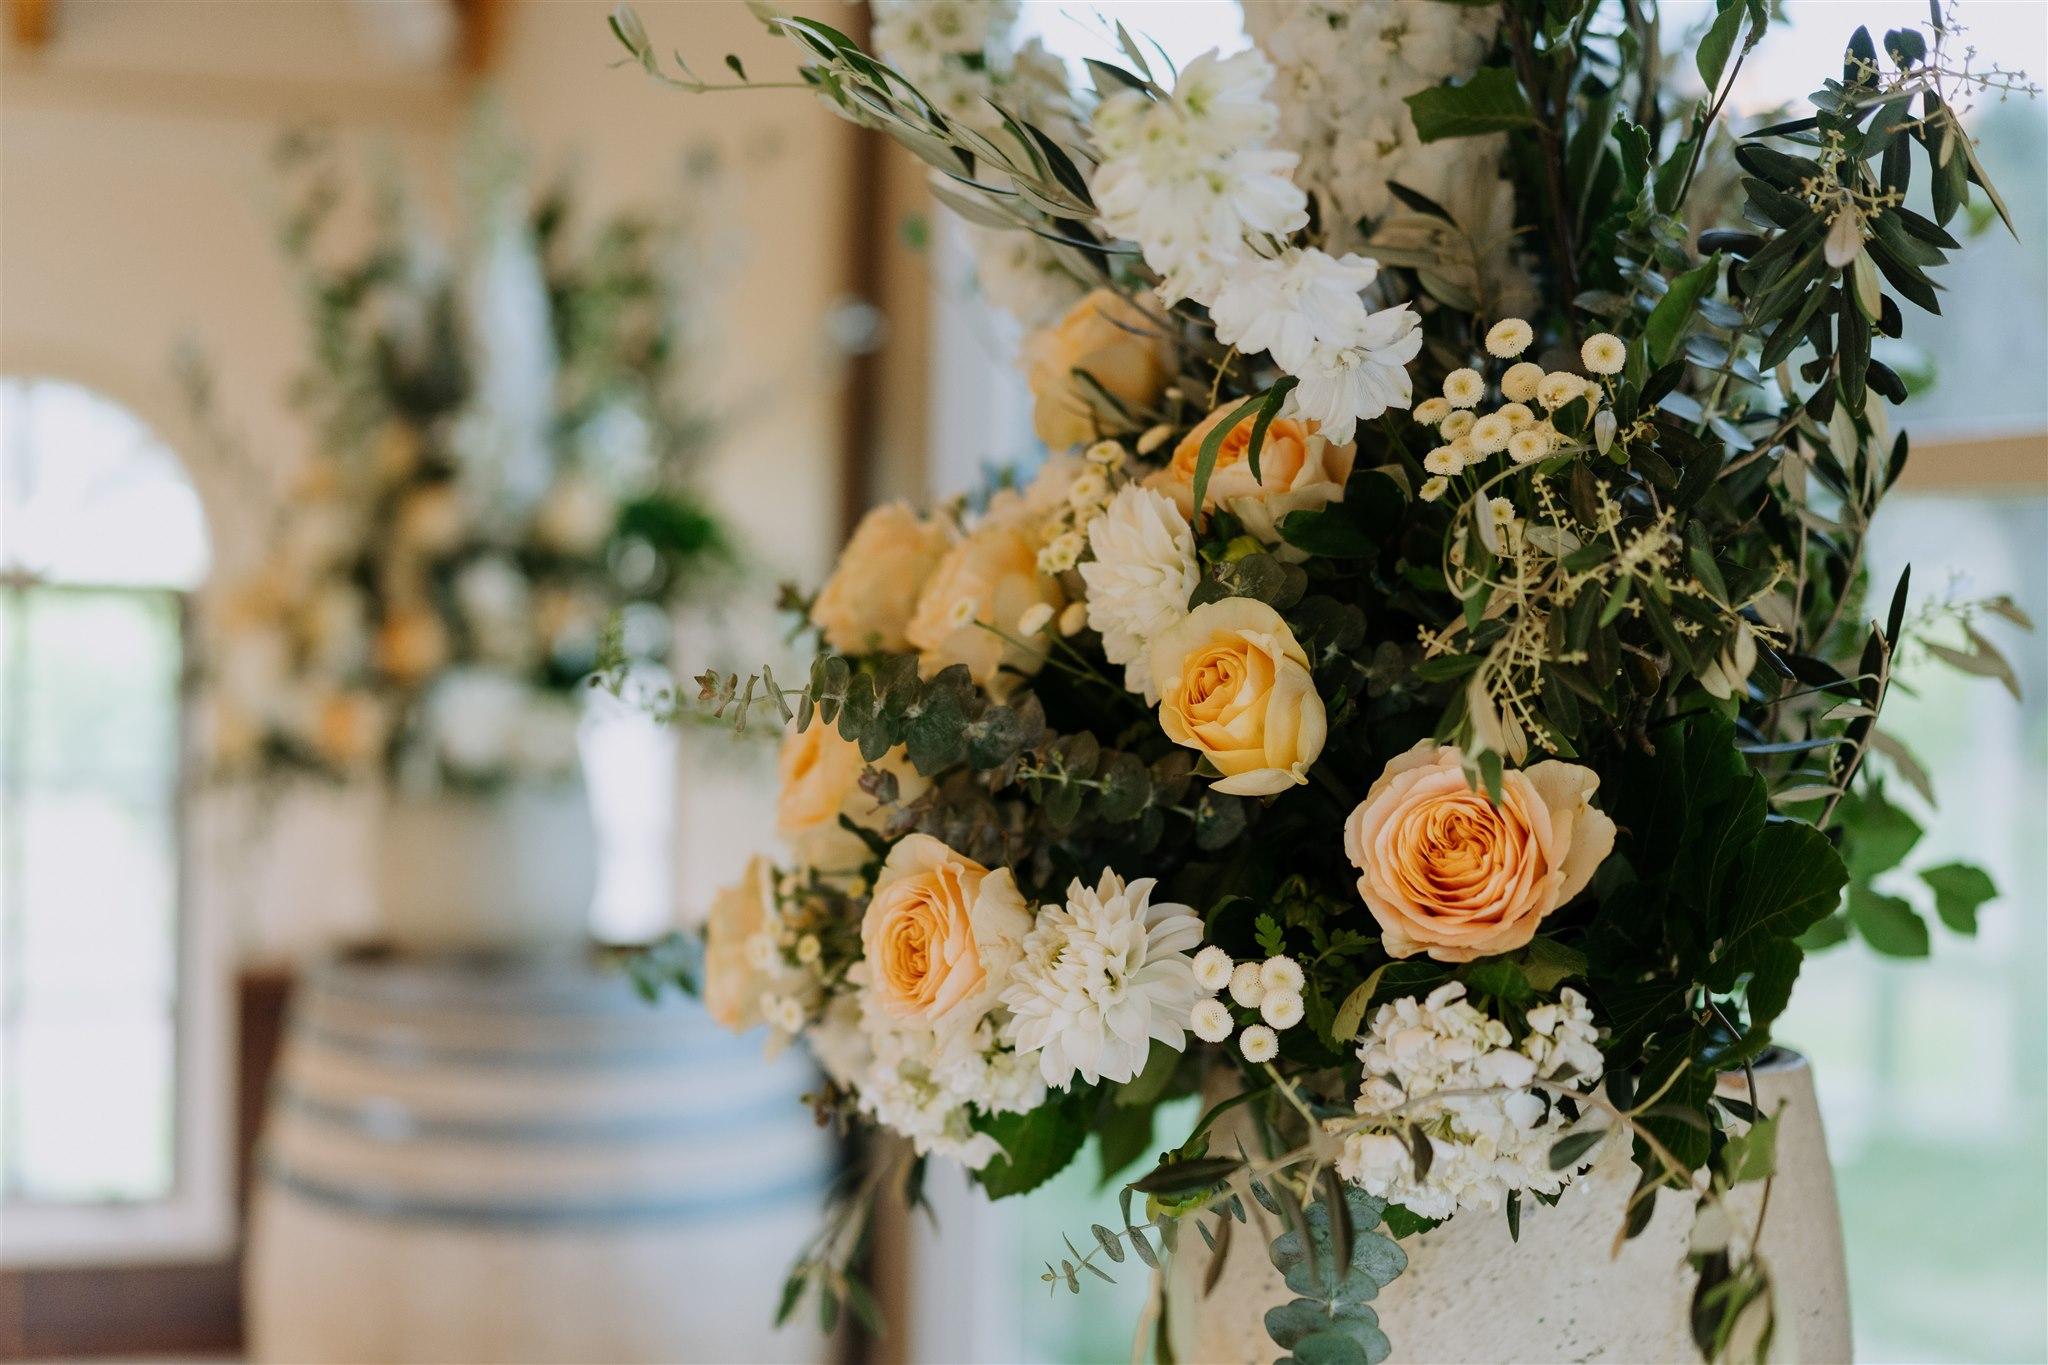 Peach and greenery wedding reception decor